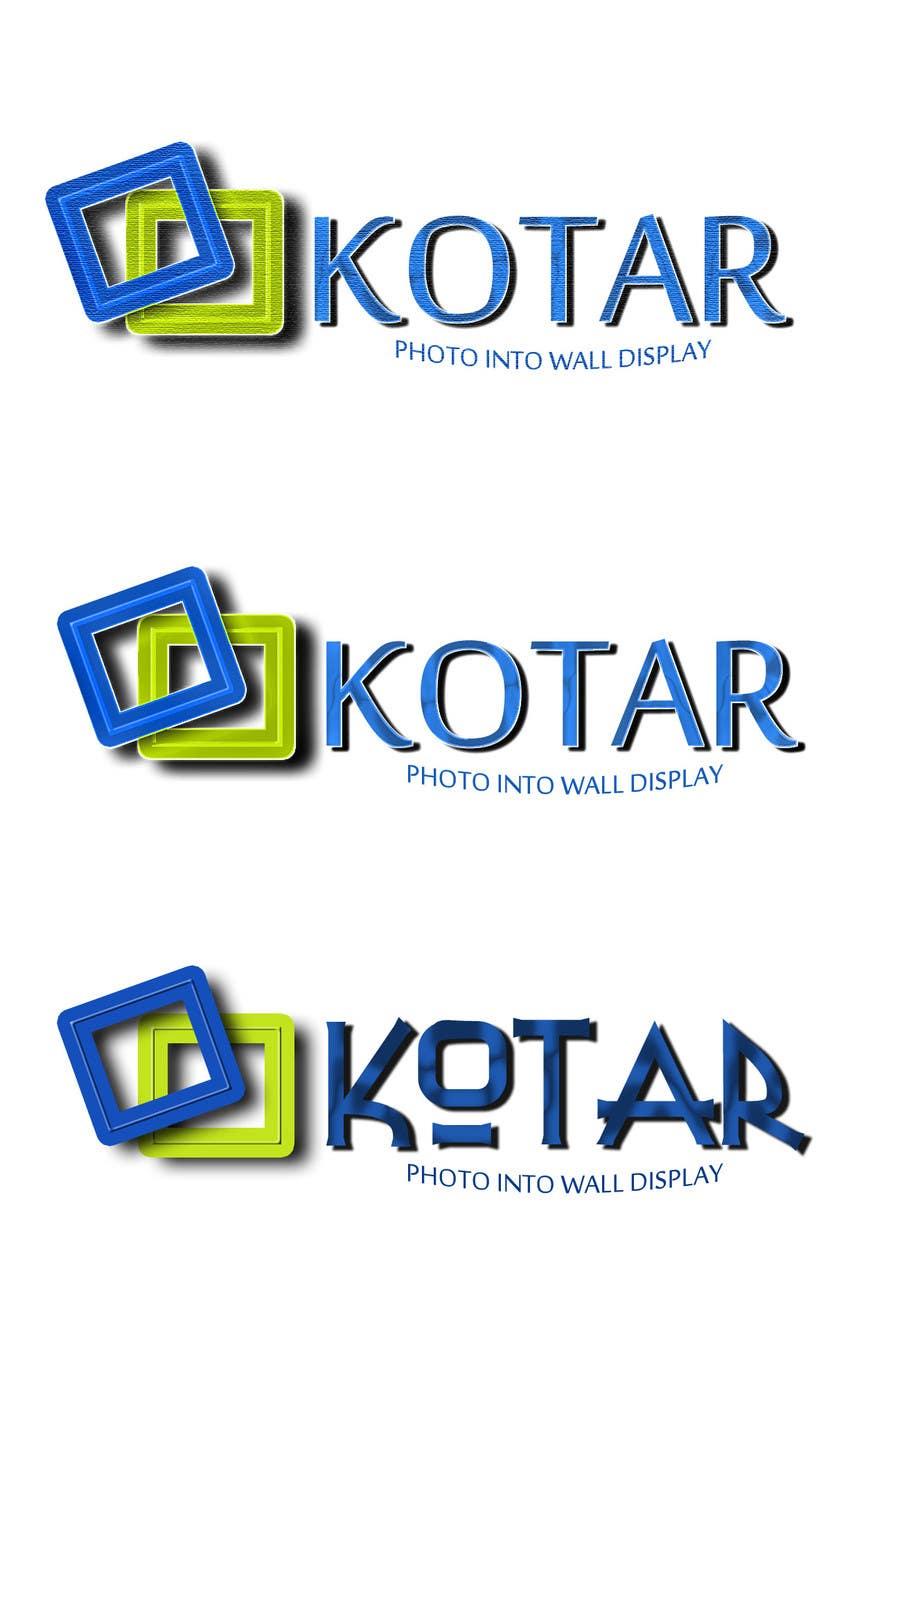 Kilpailutyö #117 kilpailussa Design a Logo for a Photo Print Company